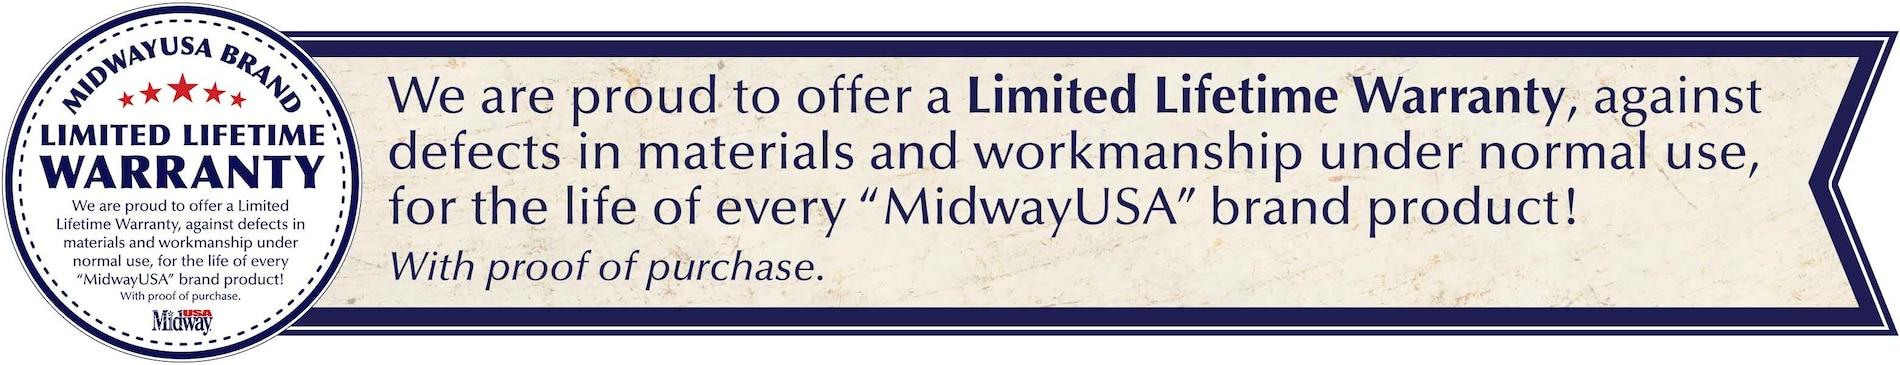 MidwayUSA | Gift Certificates | Range Bags -MidwayUSA